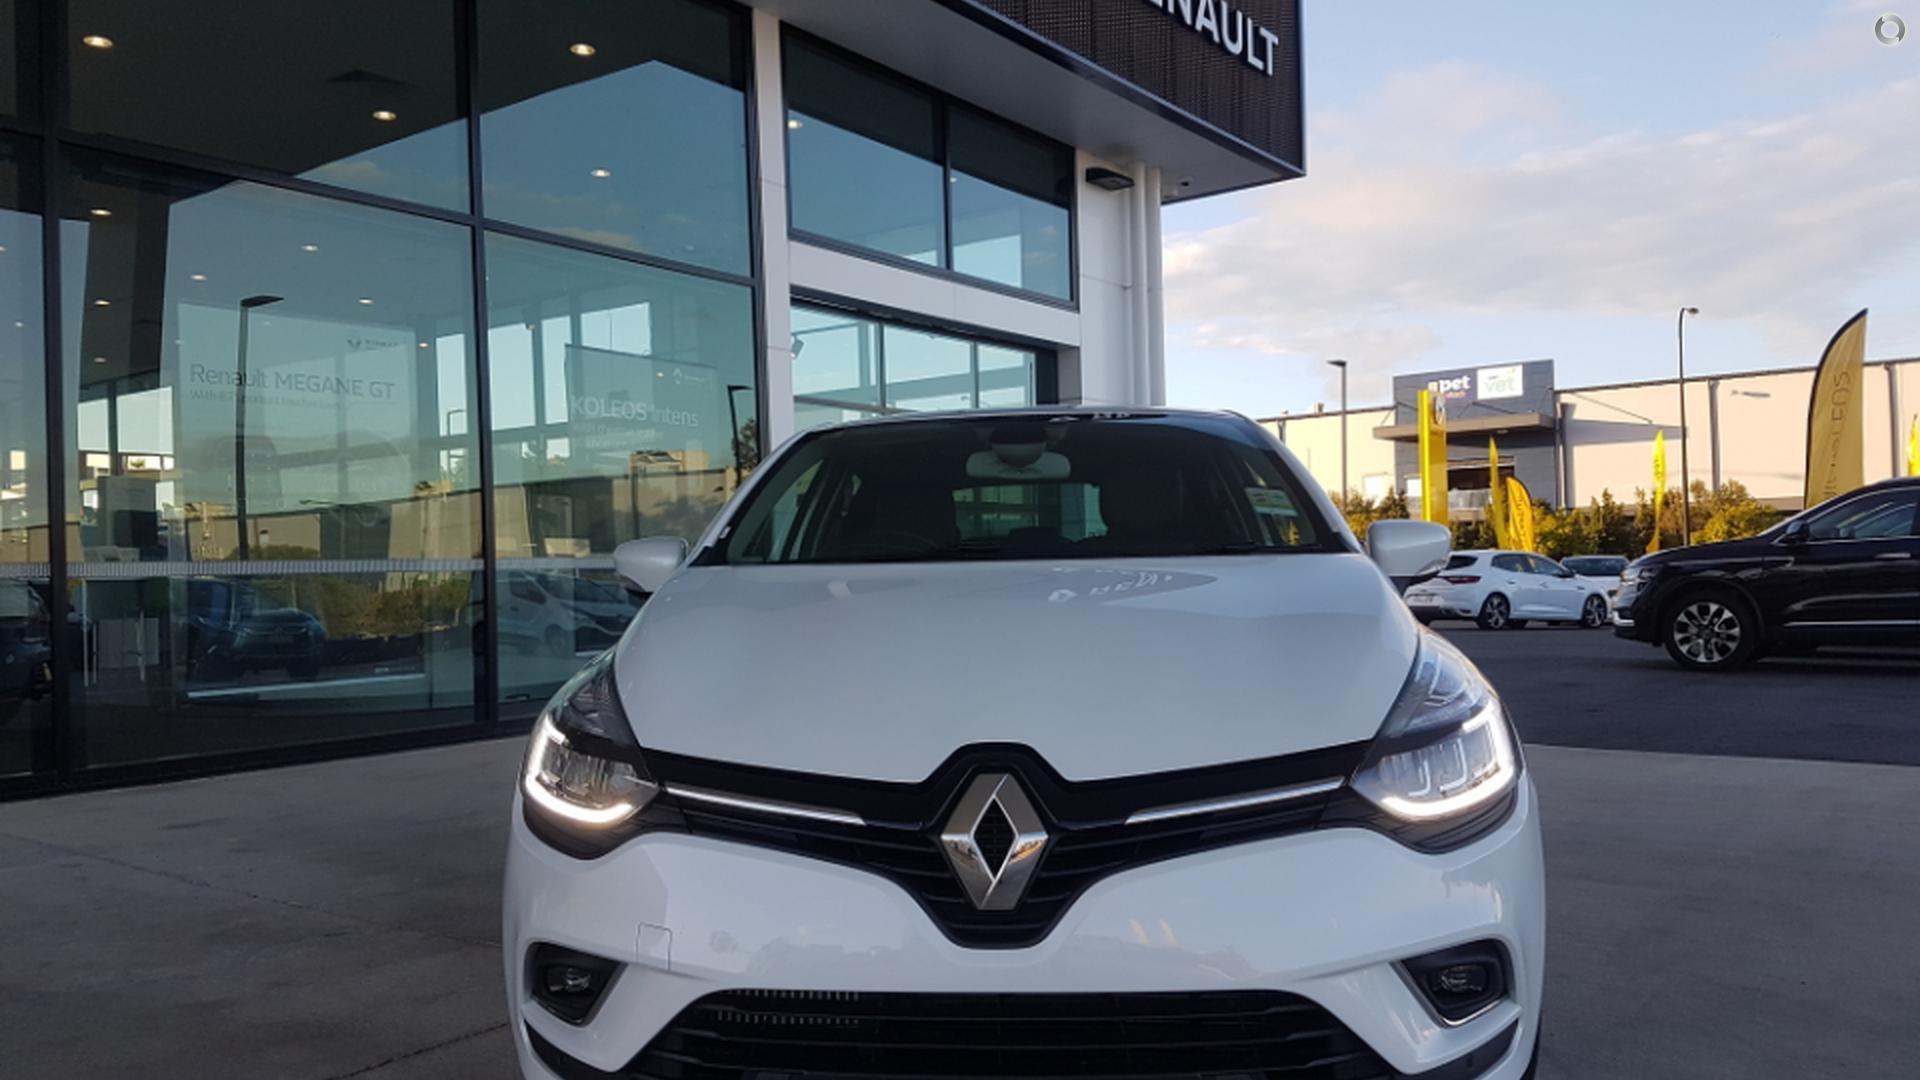 2018 Renault Clio Intens IV B98 Phase 2